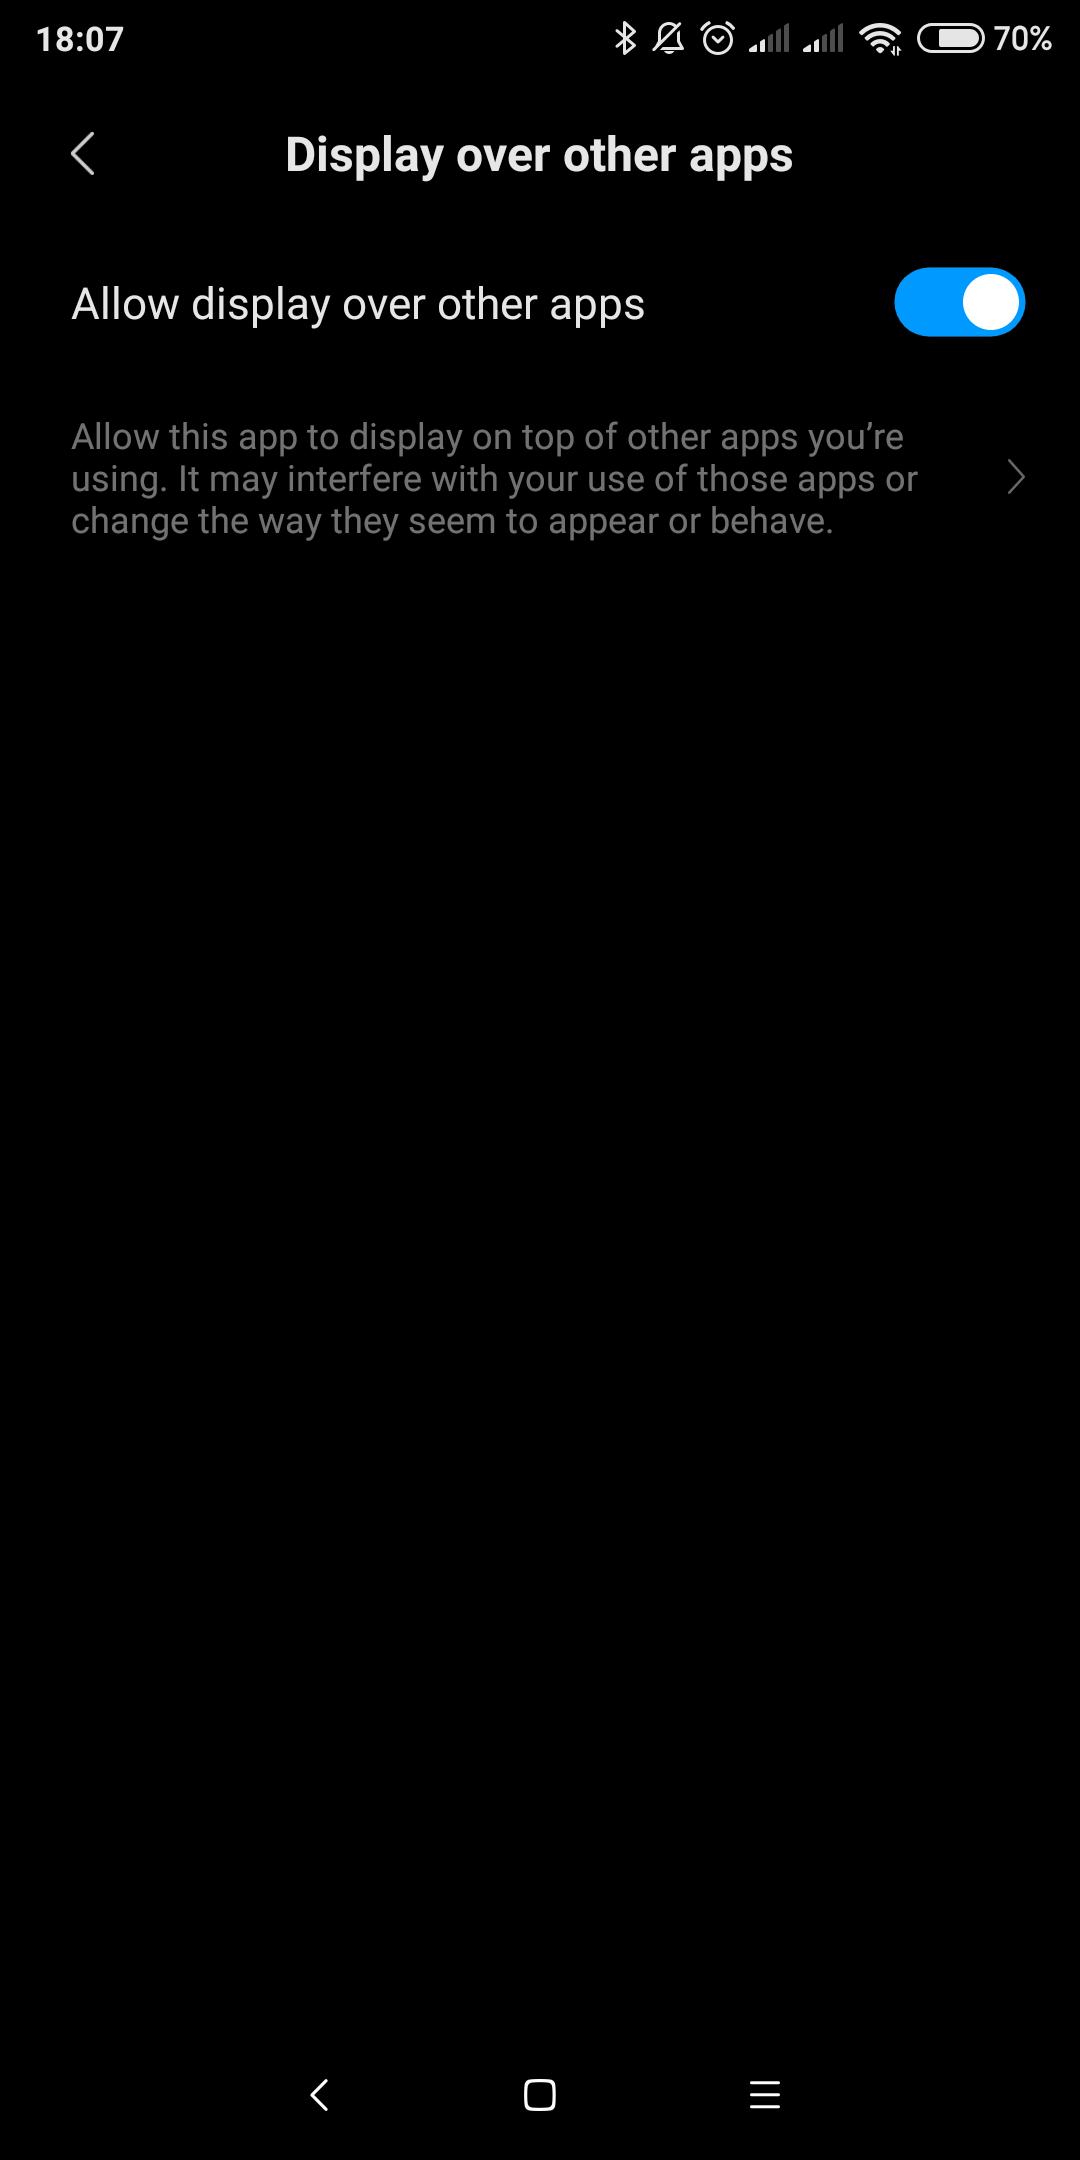 Screenshot_2019-06-05-18-07-36-755_com.android.settings.png